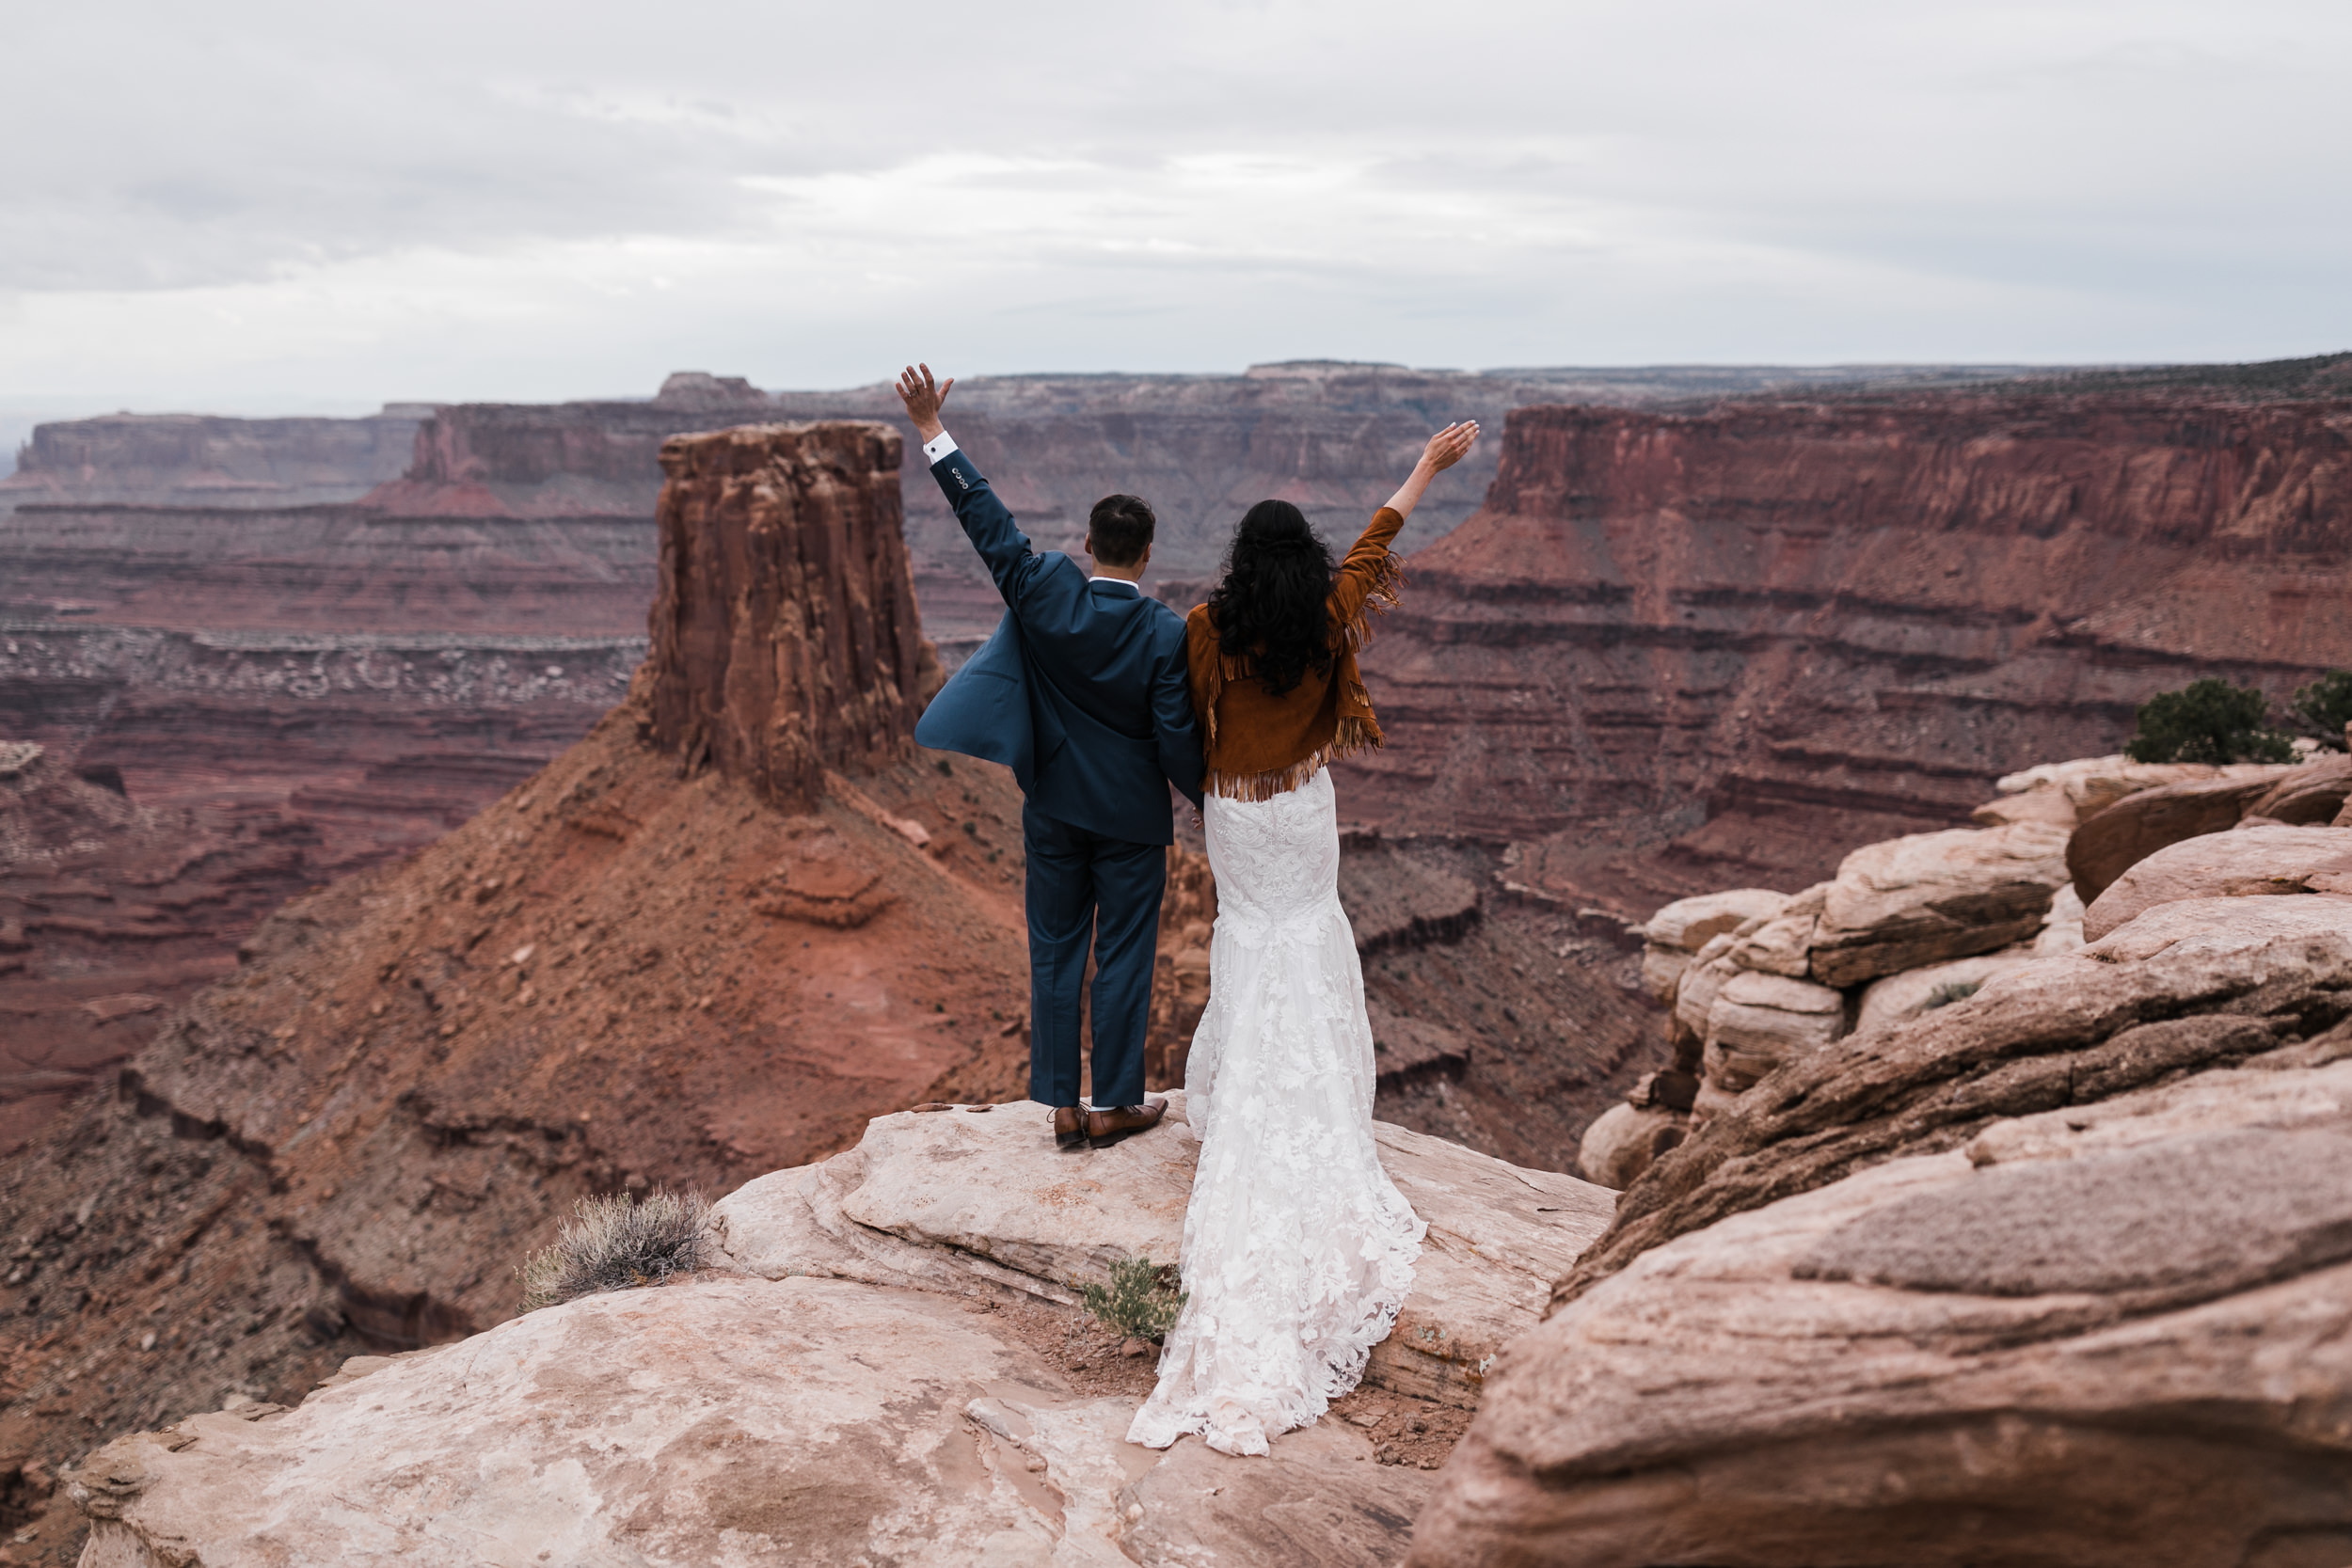 Jeep-Wedding-Moab-Utah-Hearnes-Adventure-Elopement-Photography-47.jpg